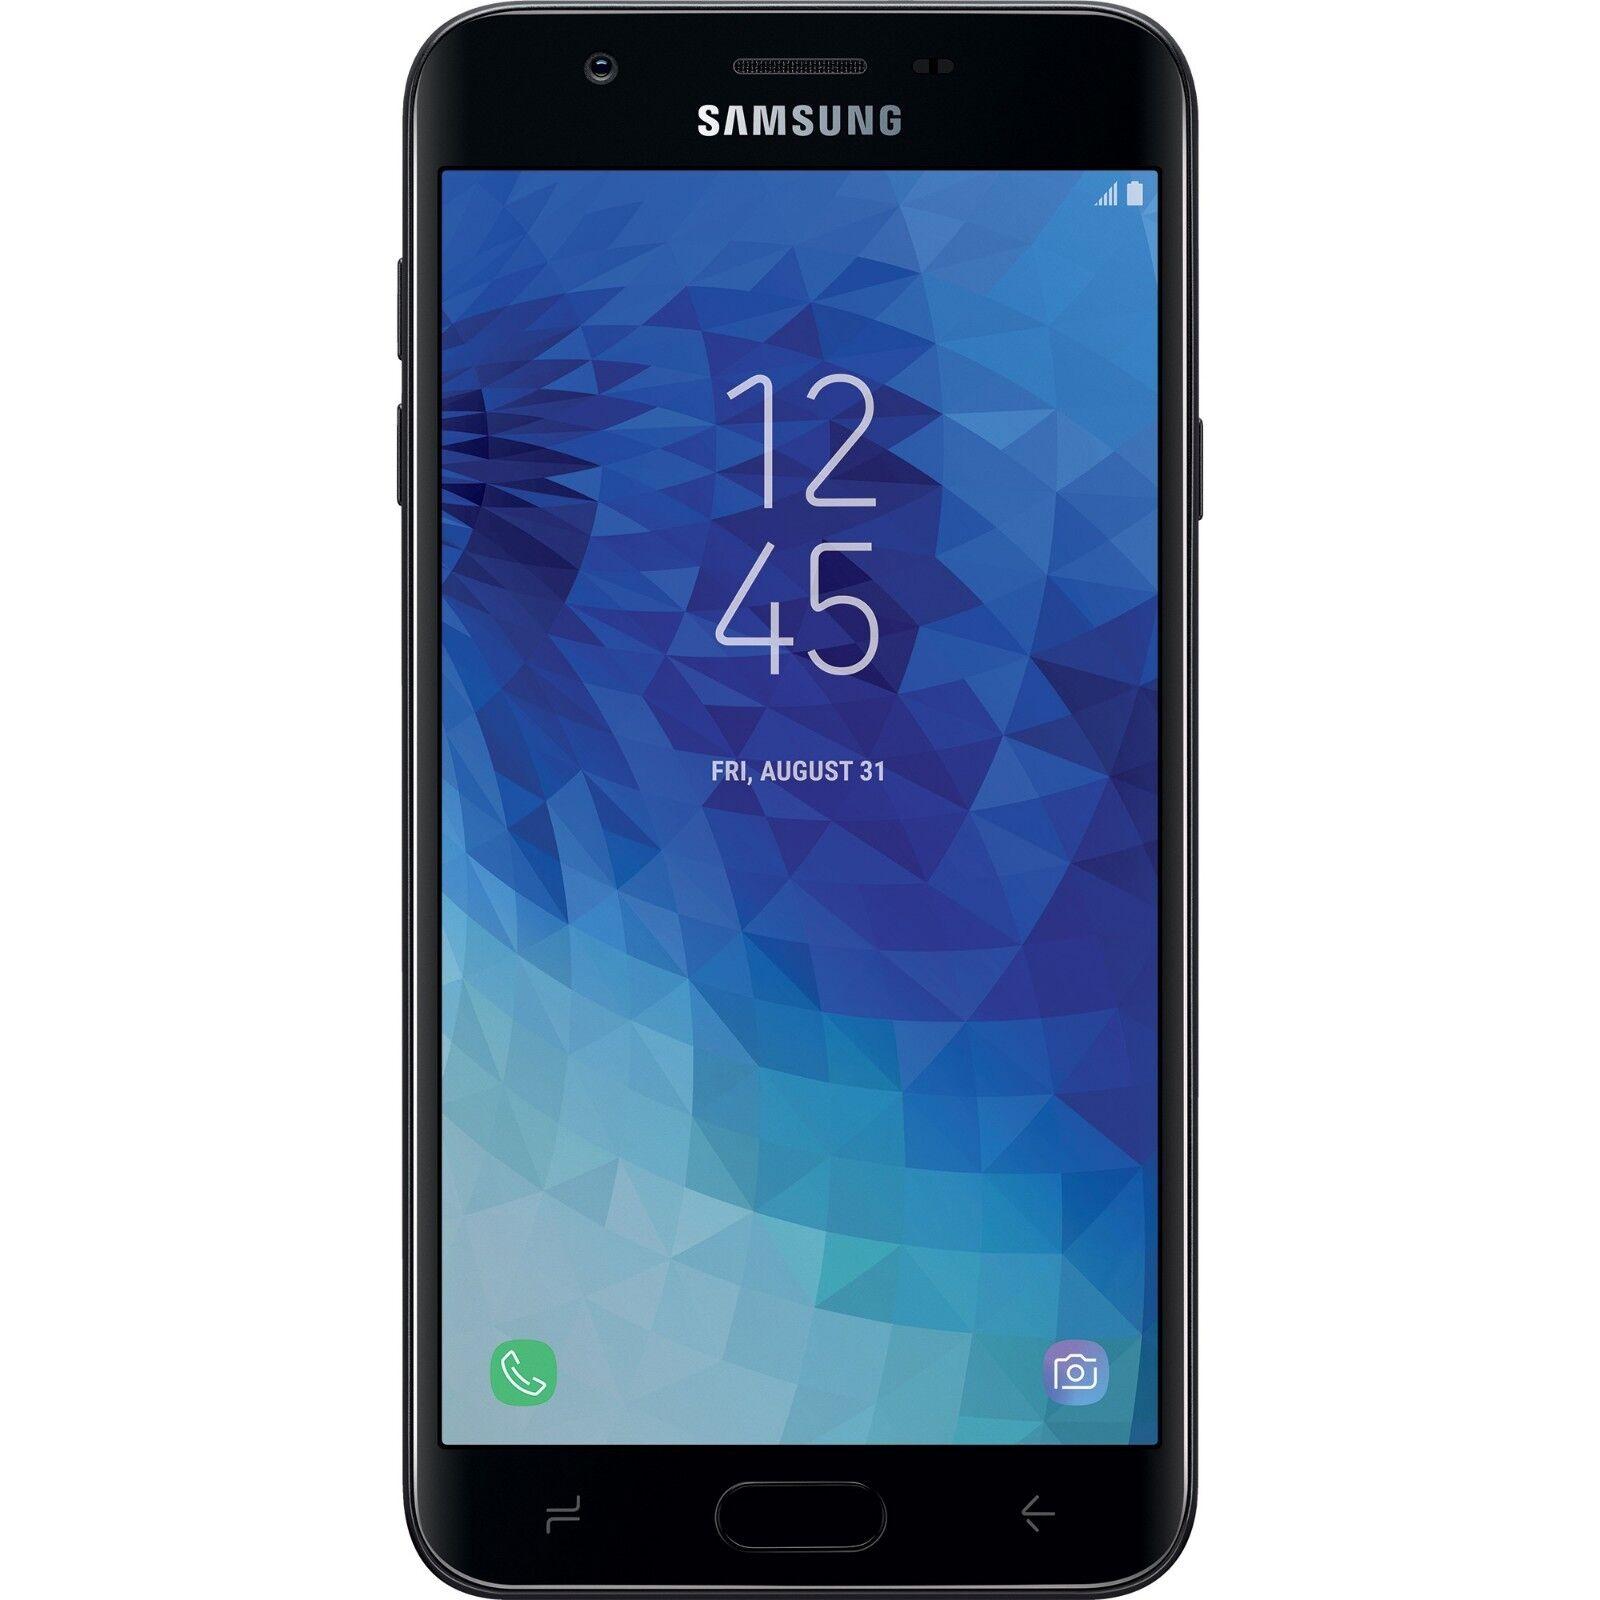 Total Wireless Samsung Galaxy J7 Crown 4G LTE Prepaid Smartp